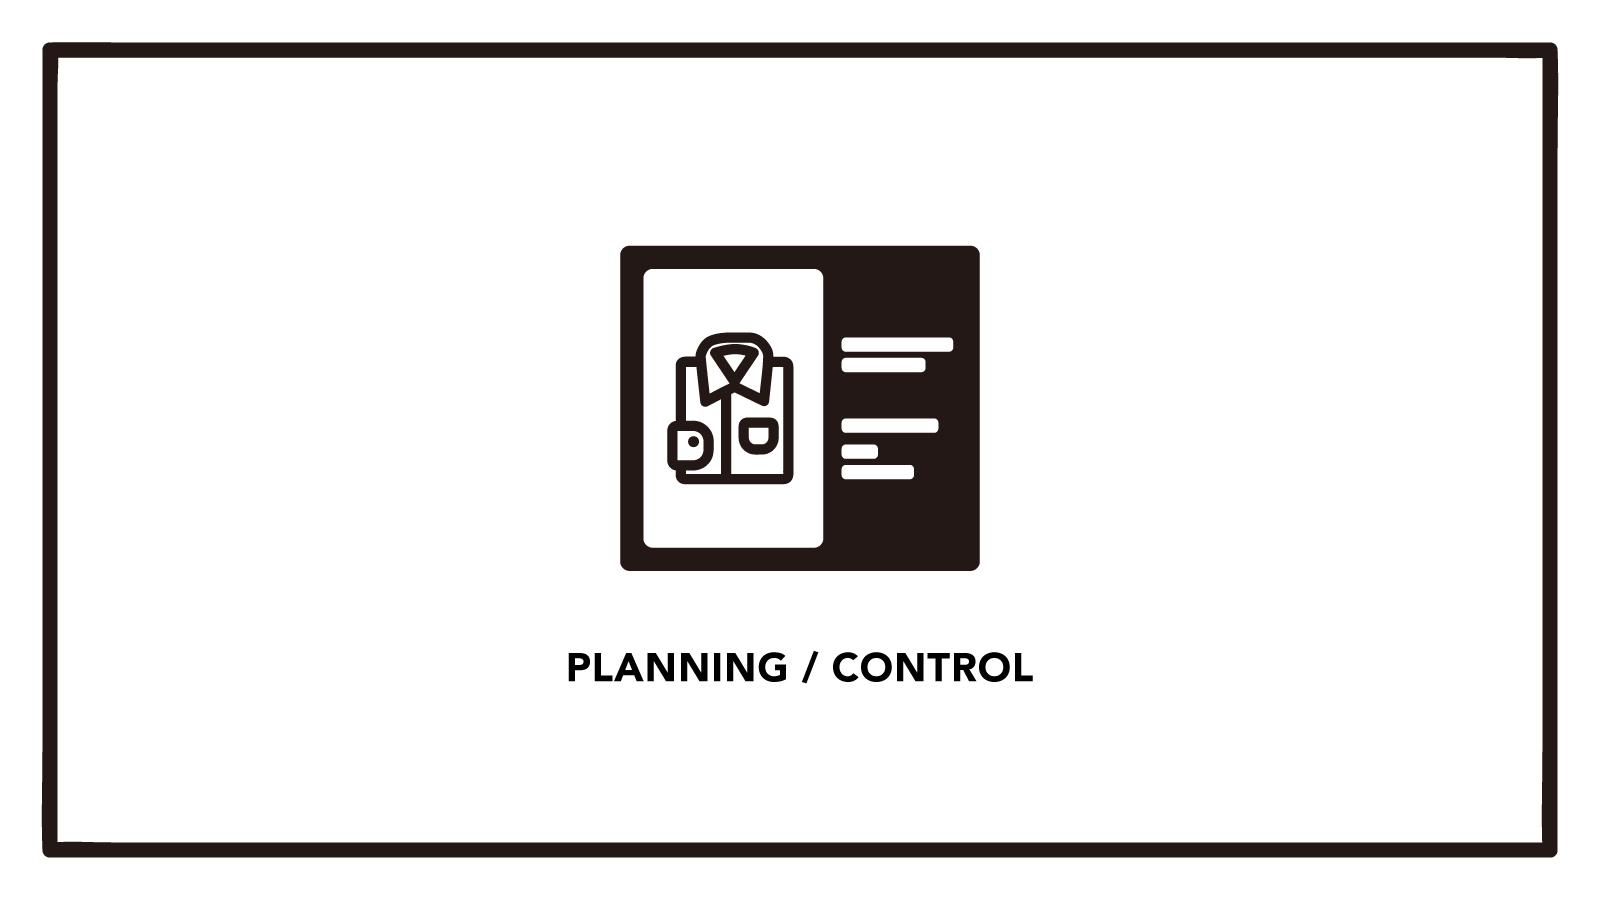 【DB/商品調達管理】急成長中のアパレルメーカーでの商品管理業務をお任せします!のカバー写真